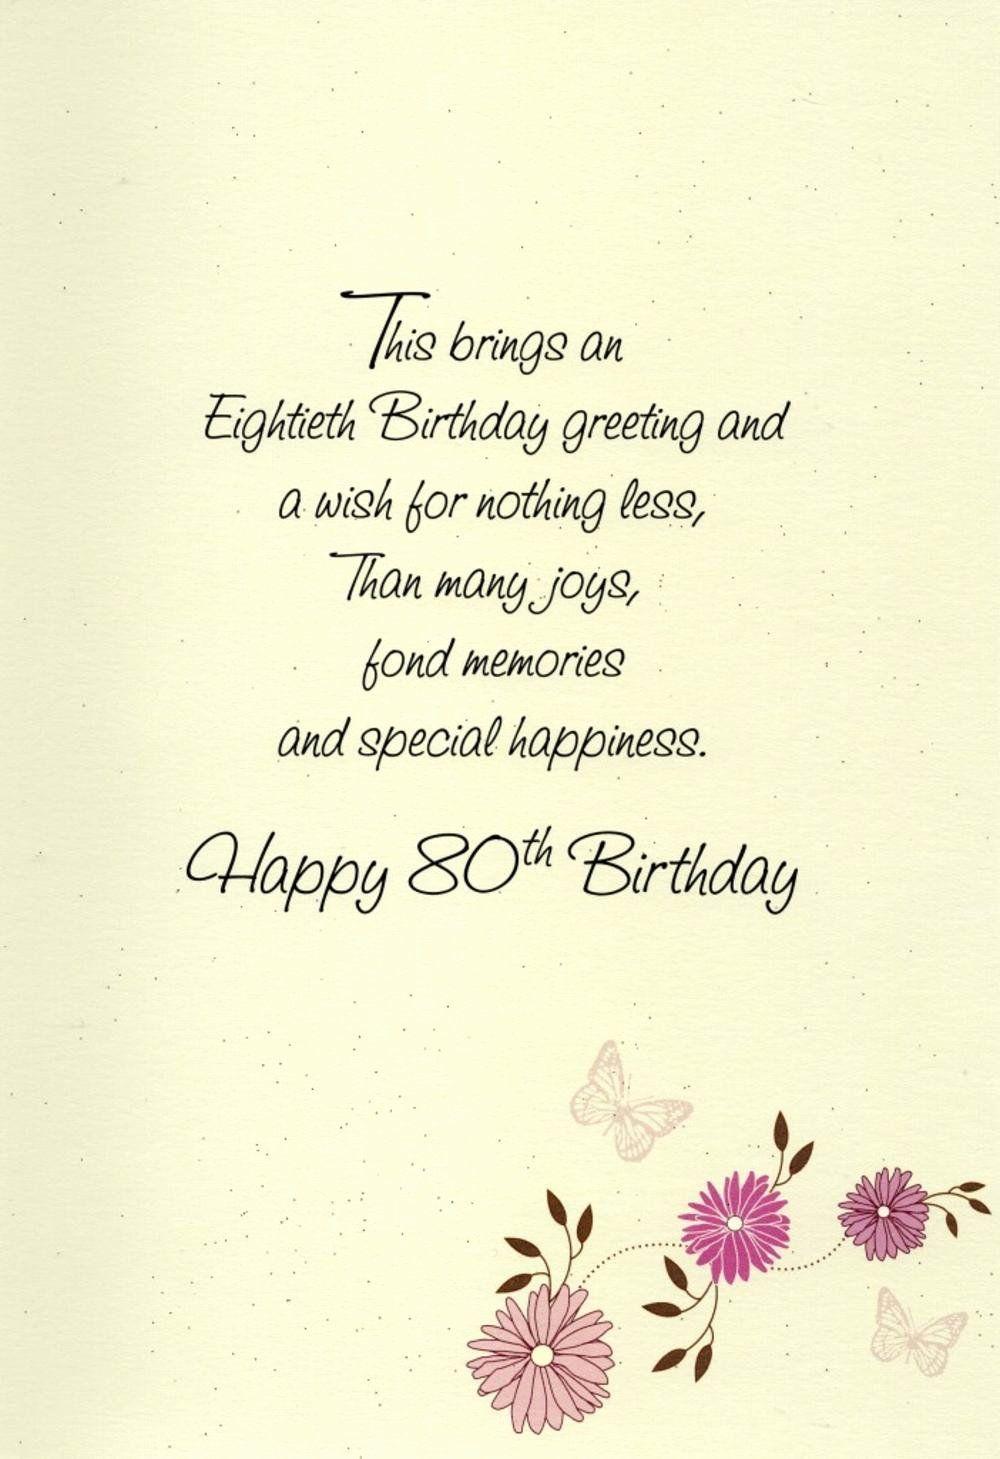 80th birthday greetings in 2020 birthday poems sister